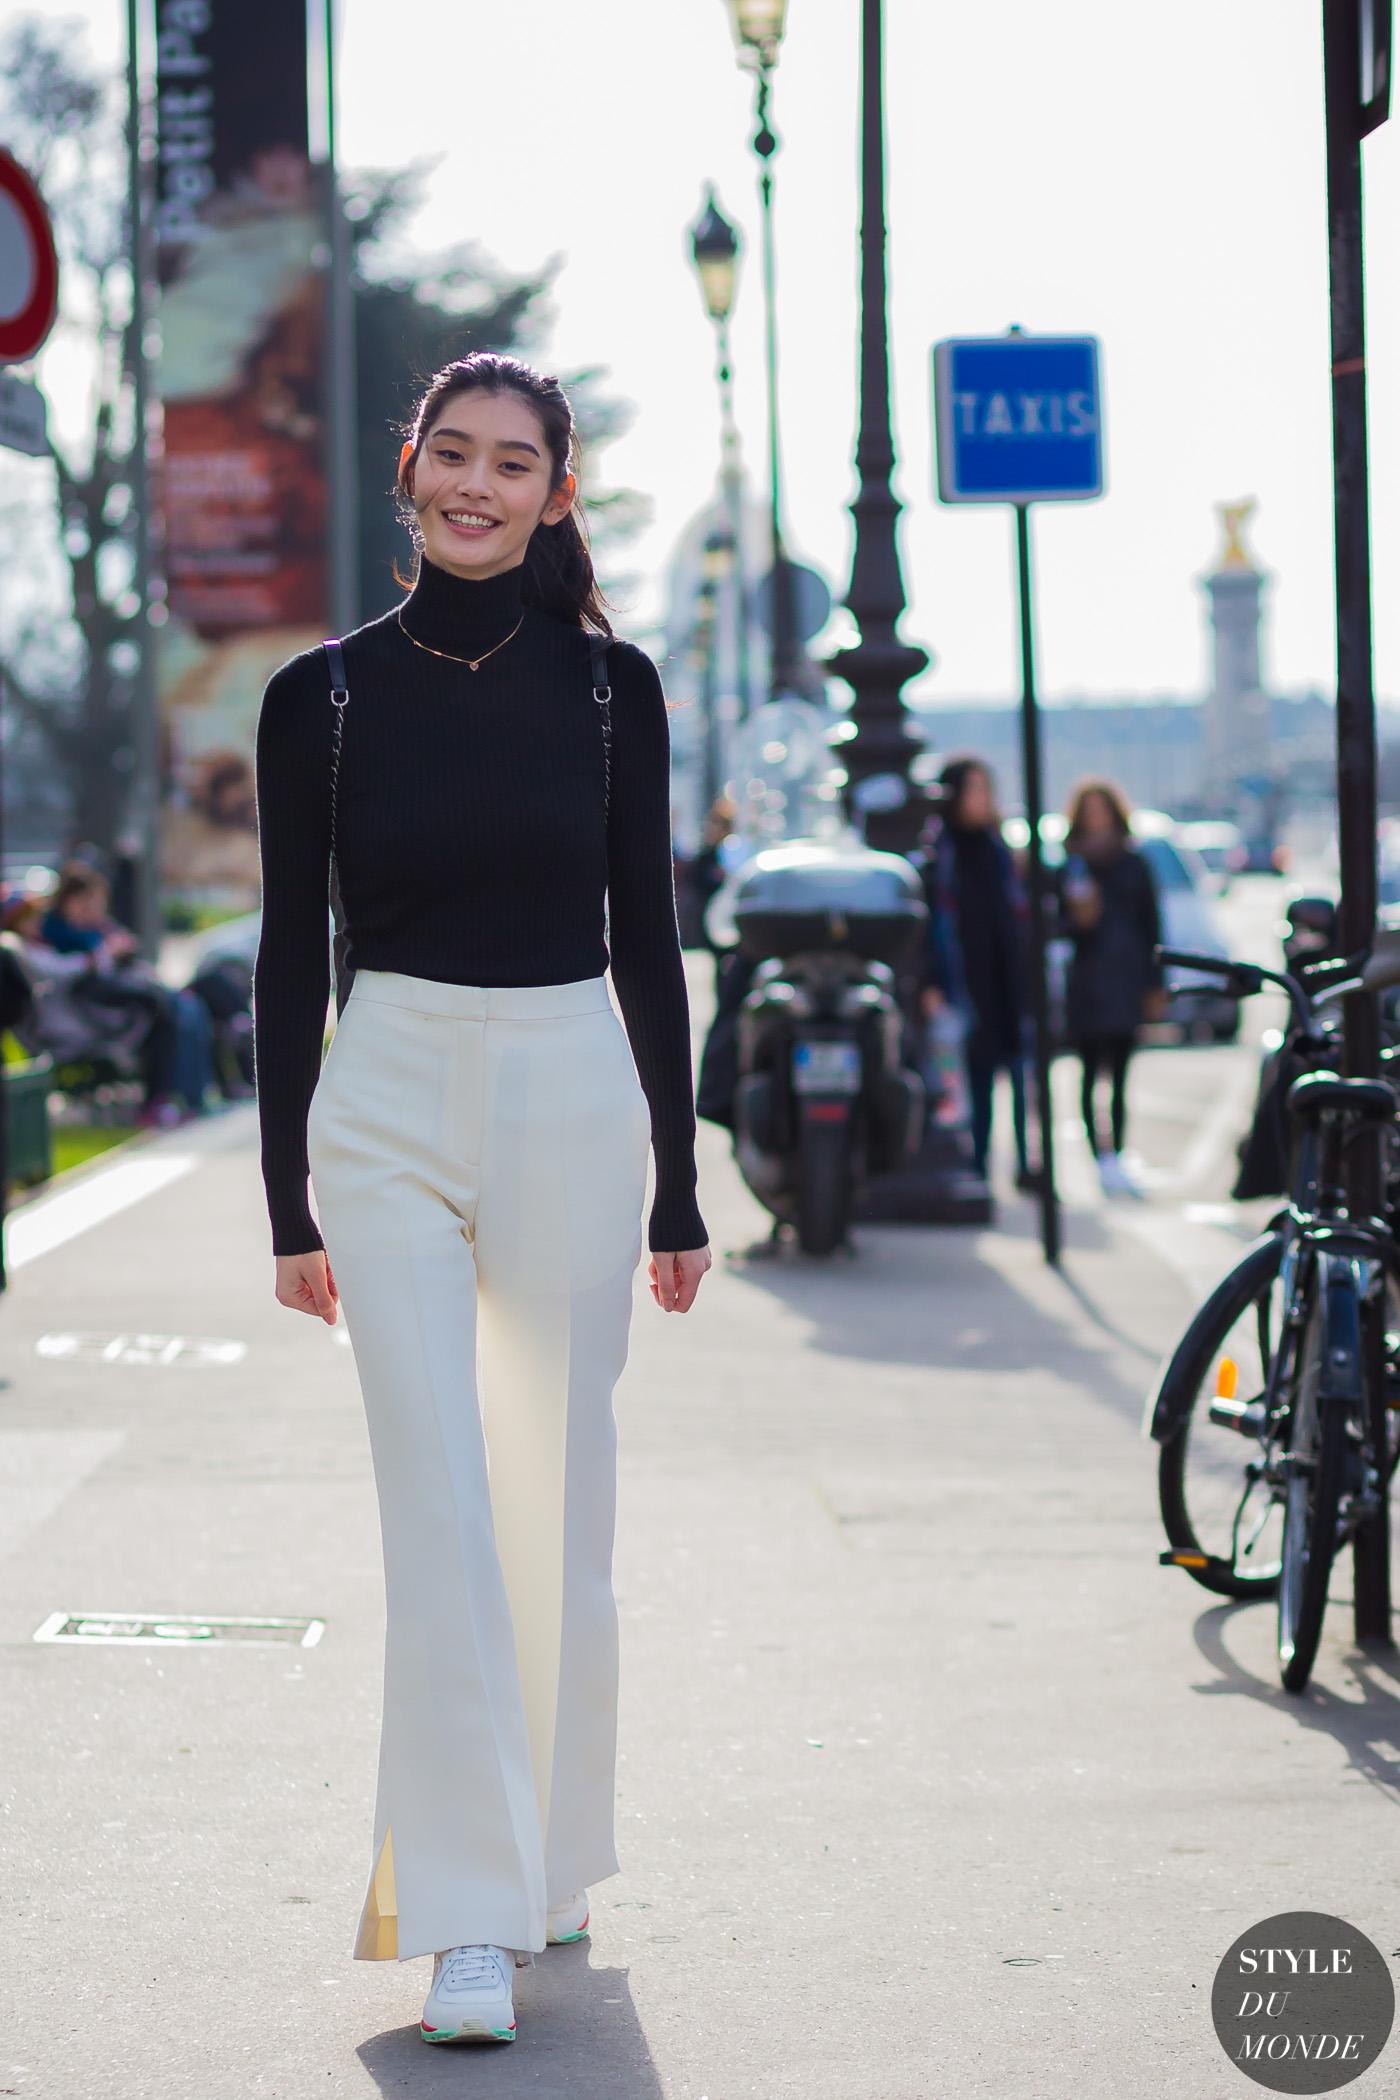 d69fd16dc Ming Xi Street Style Street Fashion Streetsnaps by STYLEDUMONDE Street  Style Fashion Photography